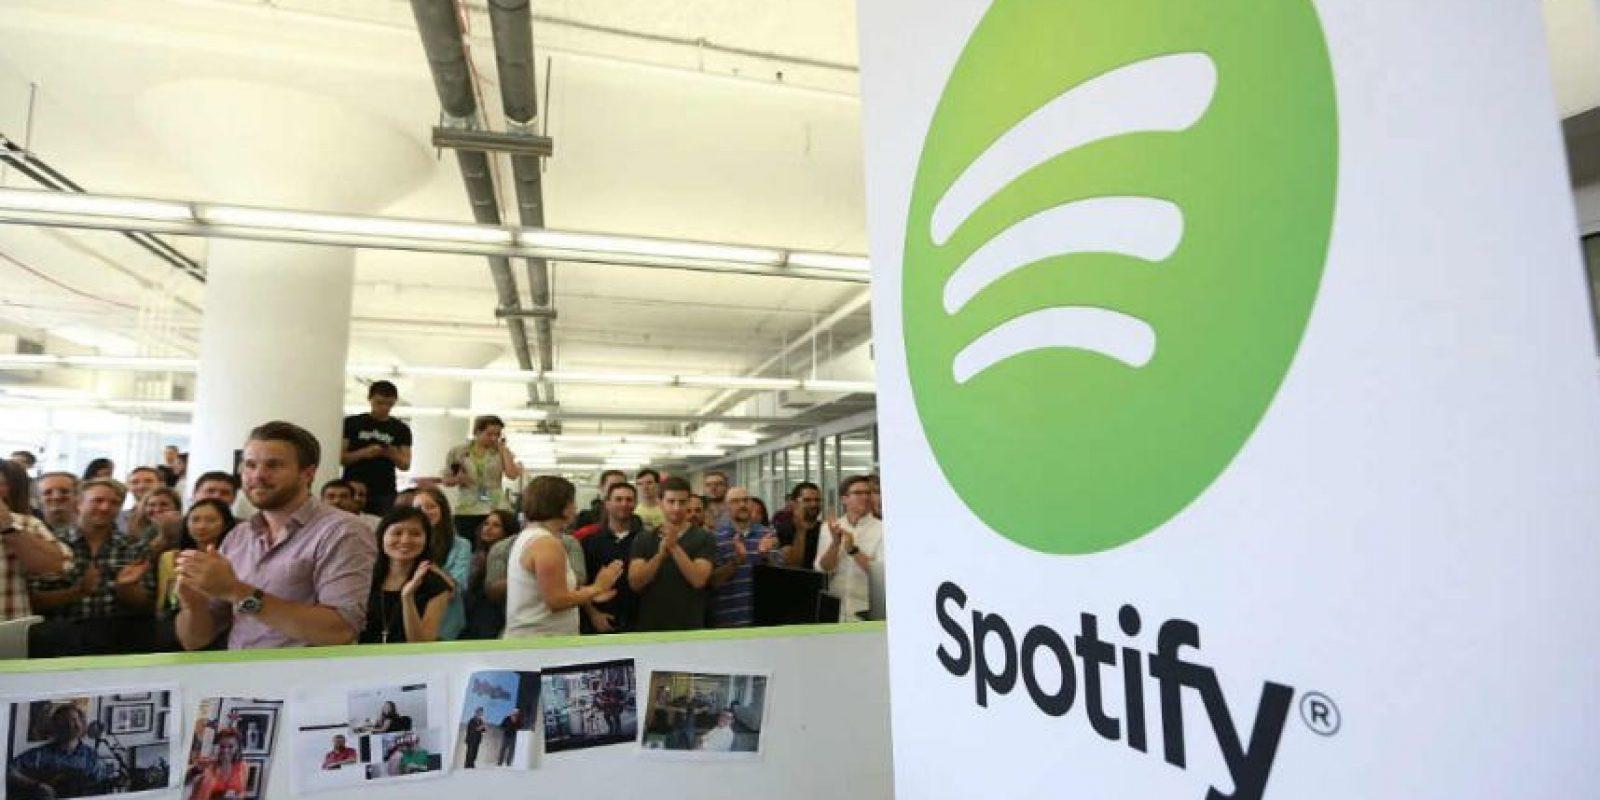 Con esto Spotify piensa competir contra Netflix. Foto:Getty Images